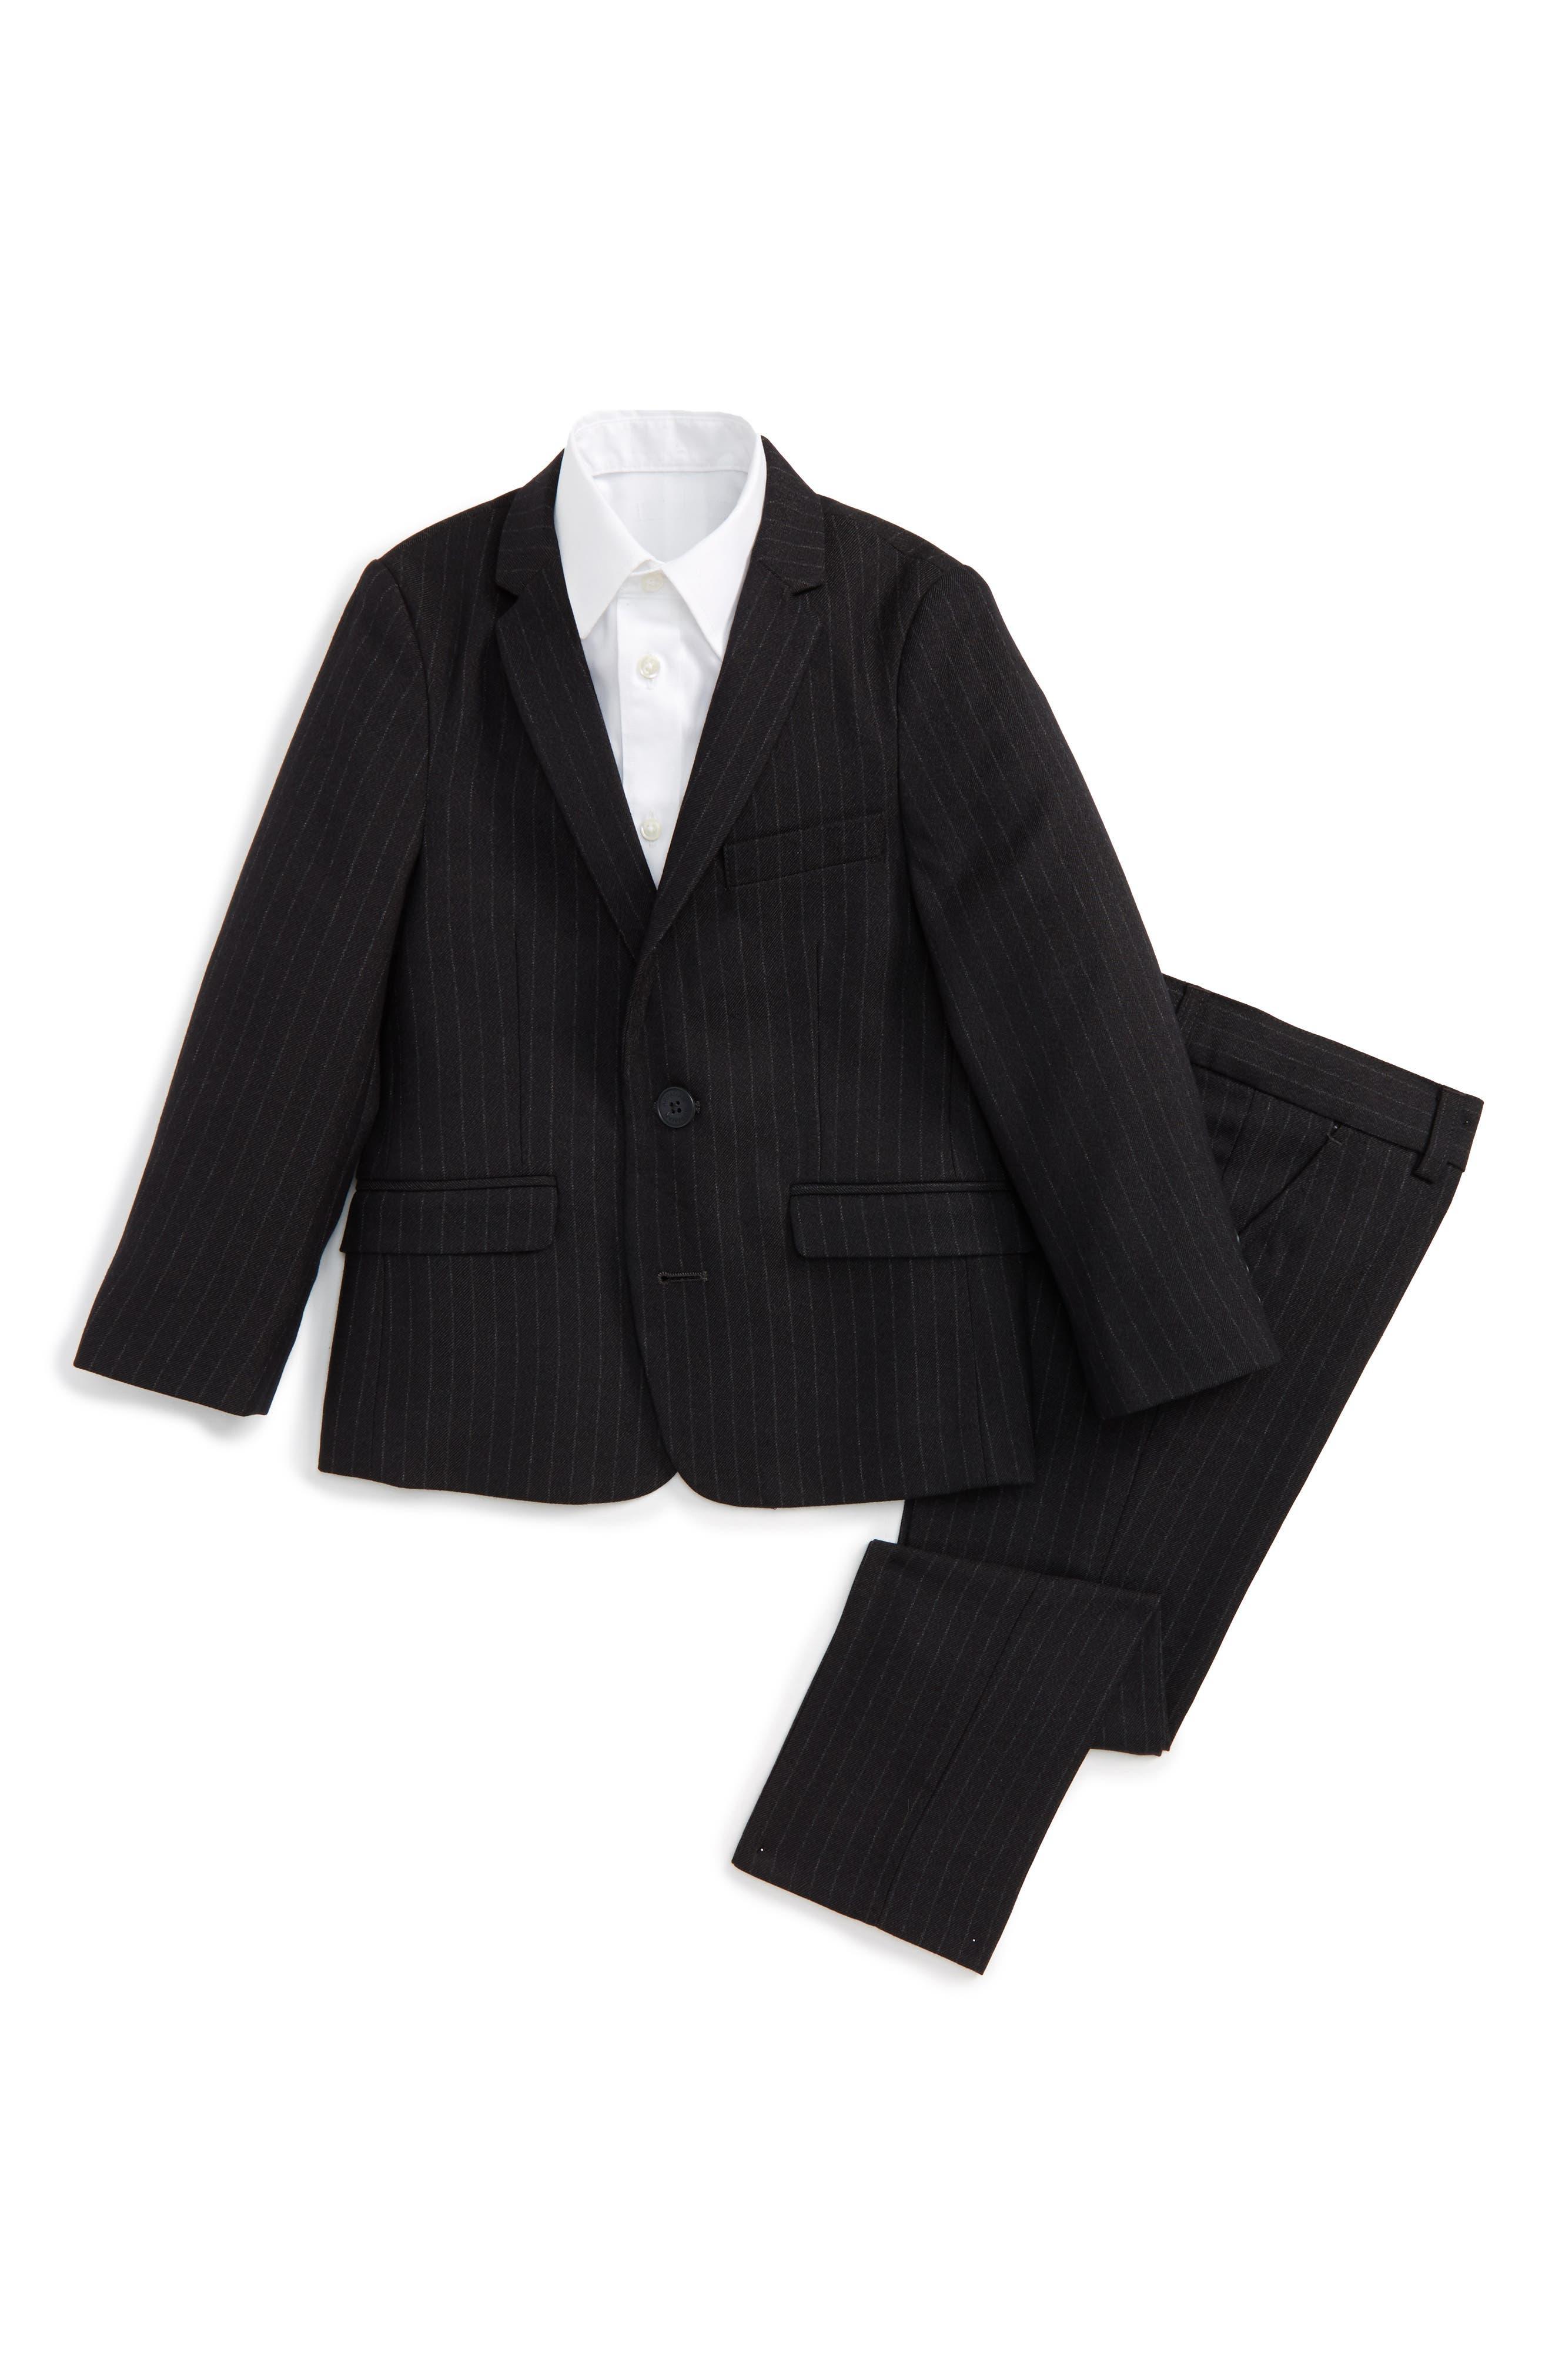 Main Image - Appaman Mod Pinstripe Suit (Toddler Boys, Little Boys & Big Boys)